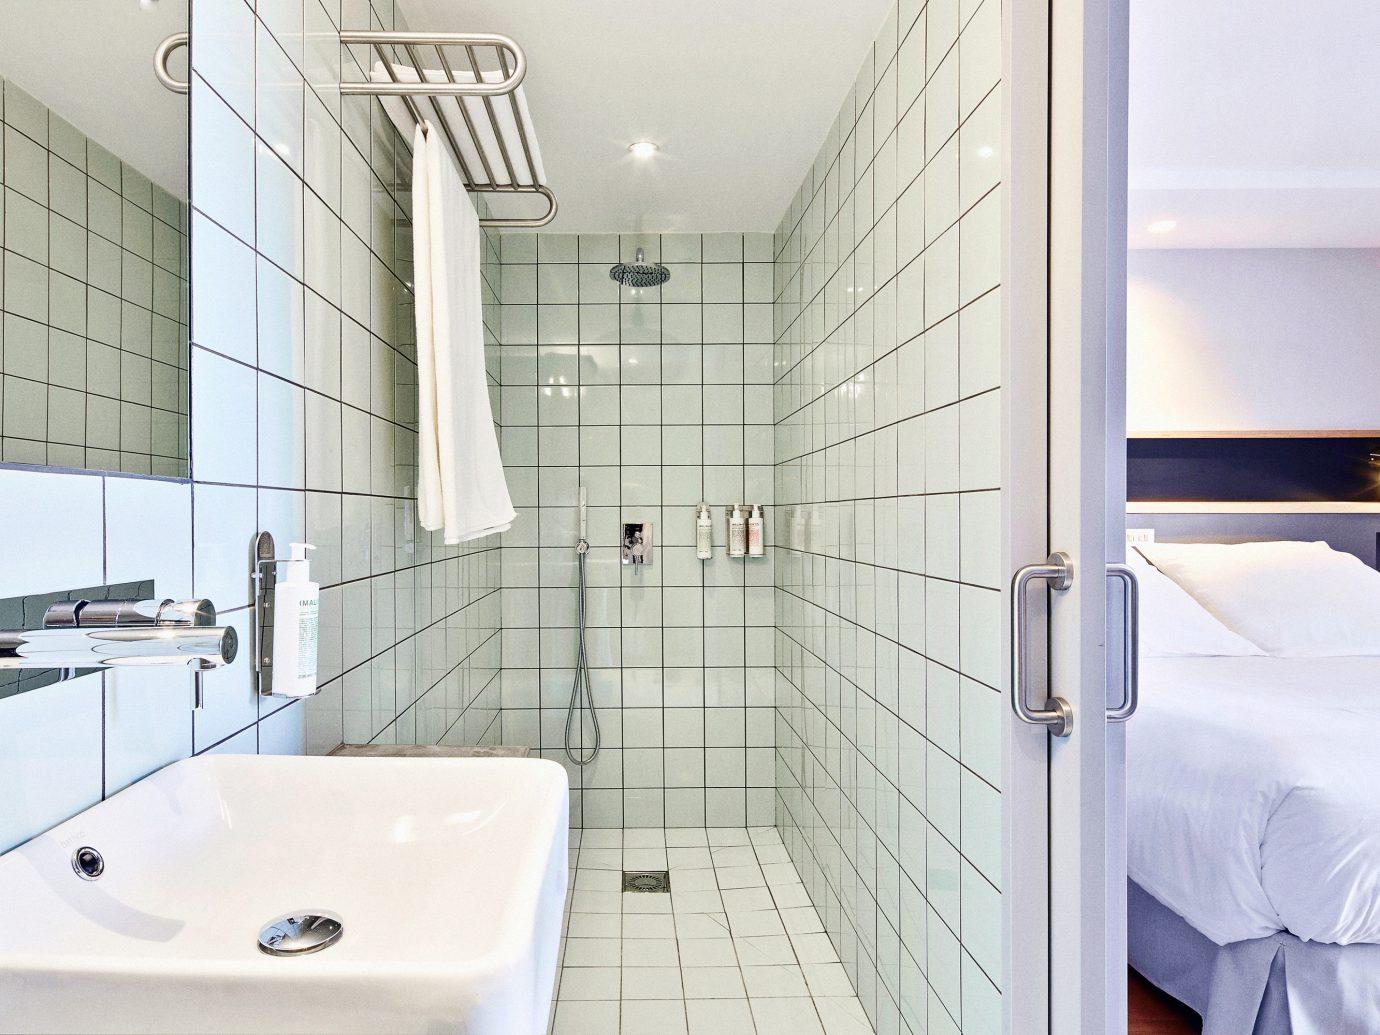 Barcelona Hotels Spain indoor bathroom room property interior design floor tile real estate tap product design plumbing fixture flooring daylighting angle Suite estate interior designer toilet tiled